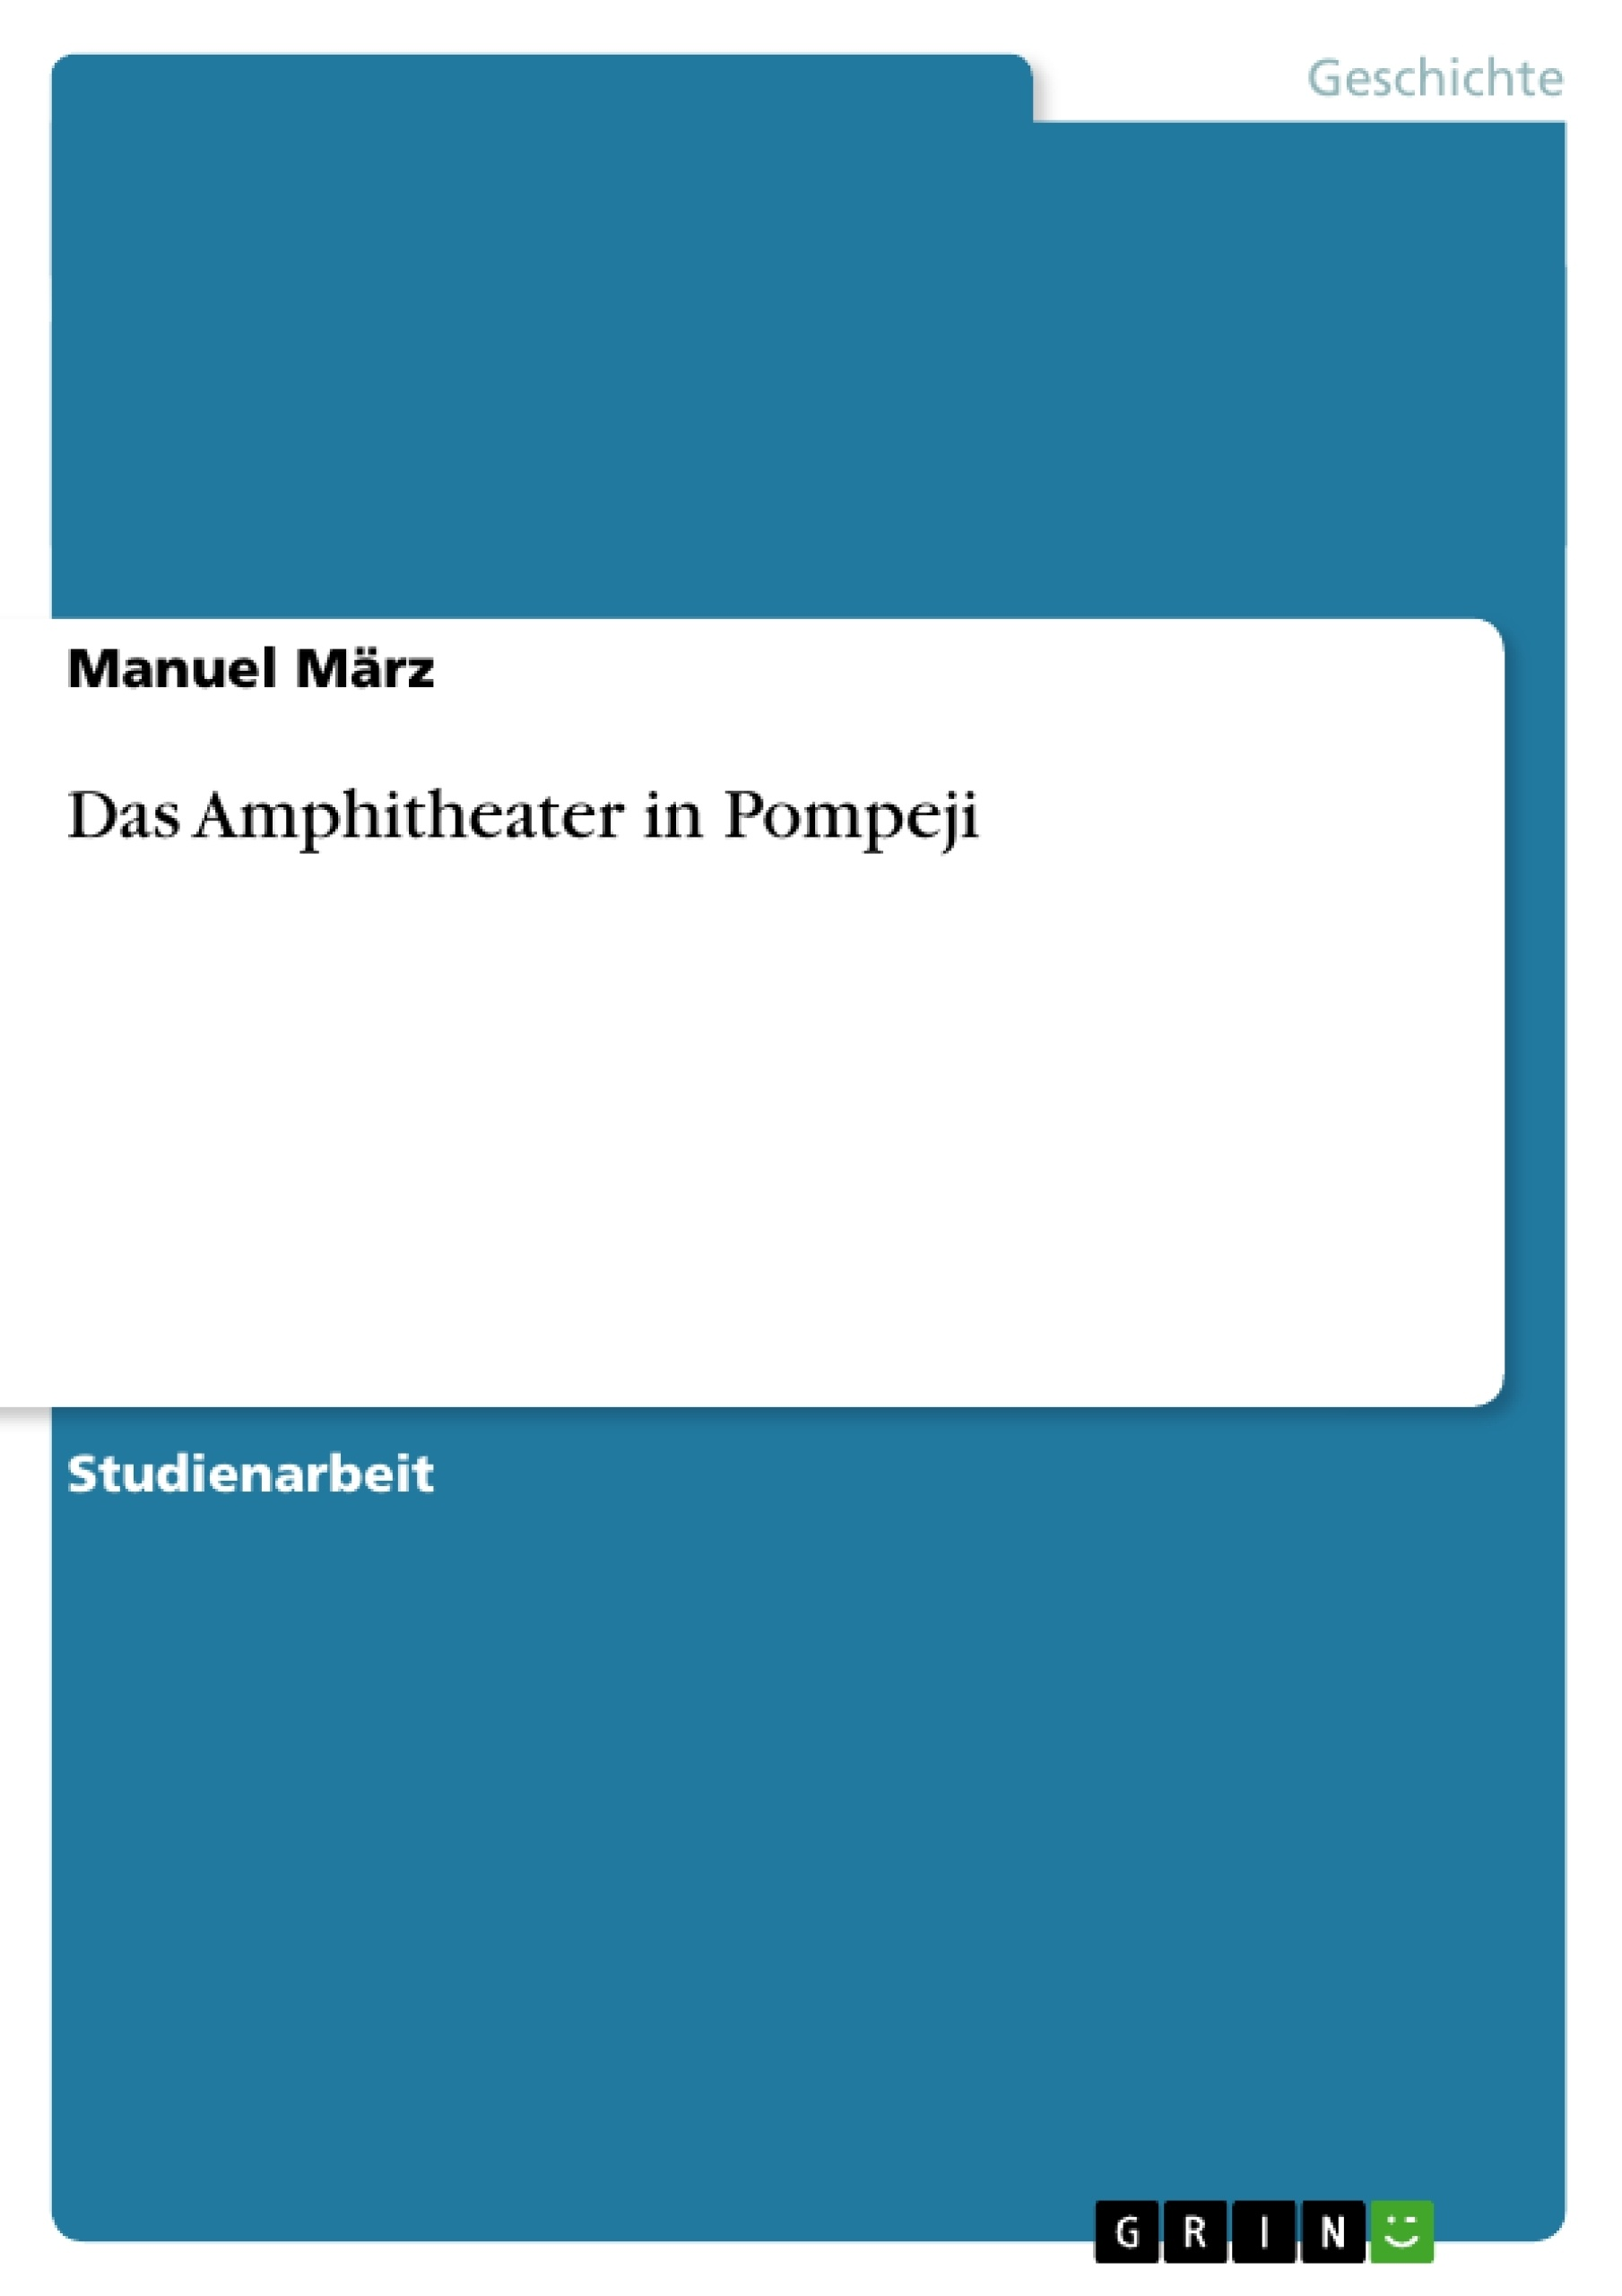 Titel: Das Amphitheater in Pompeji